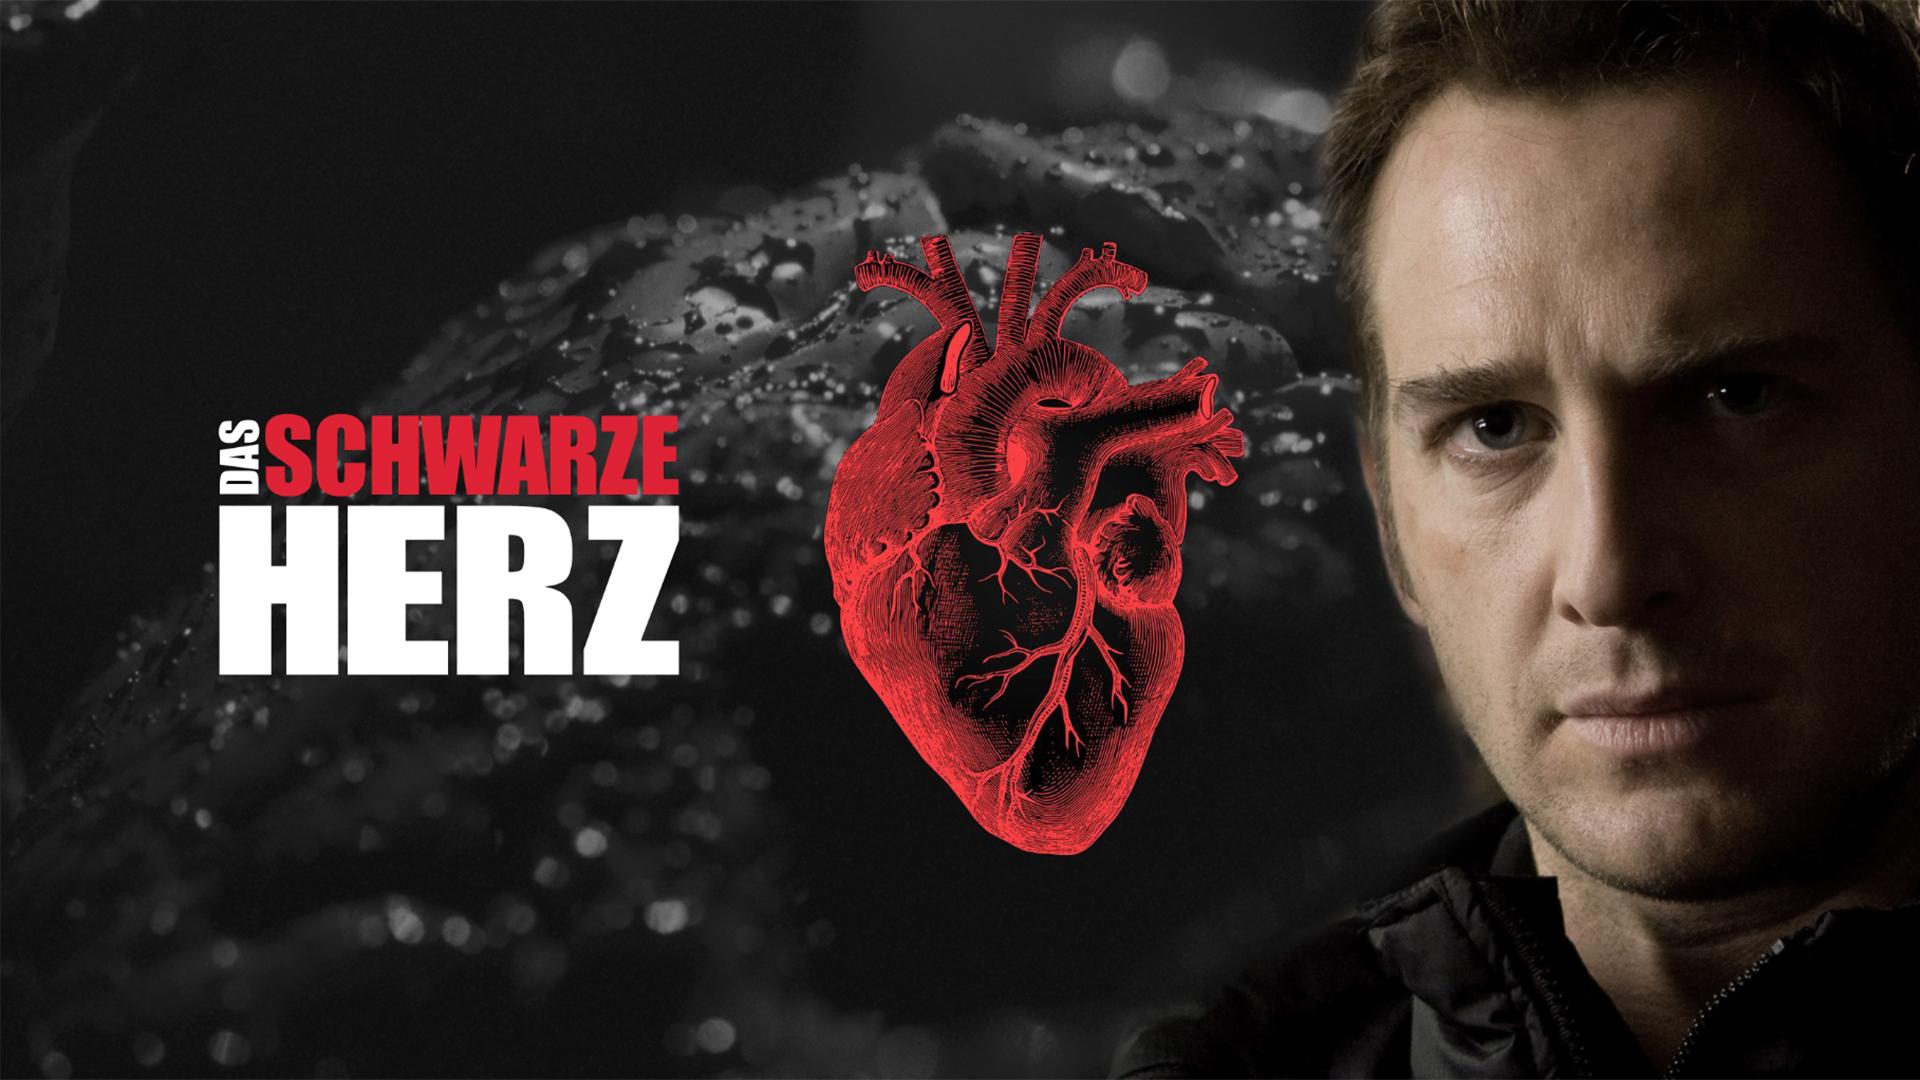 Schwarze Herz